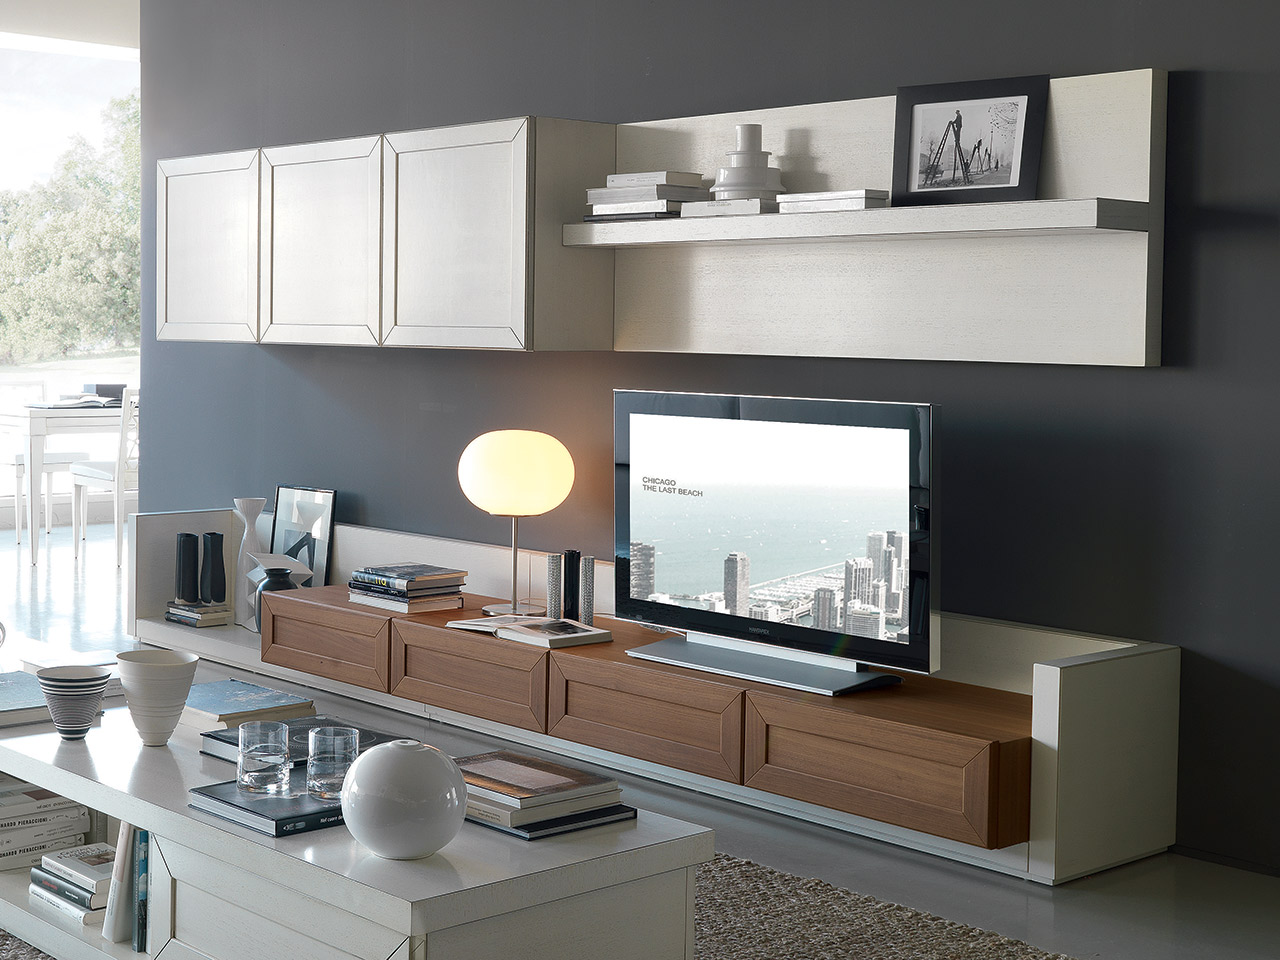 Sistema Opera OS07 - Designer Bruno Piombini - Store: Casa Outlet Arredamenti